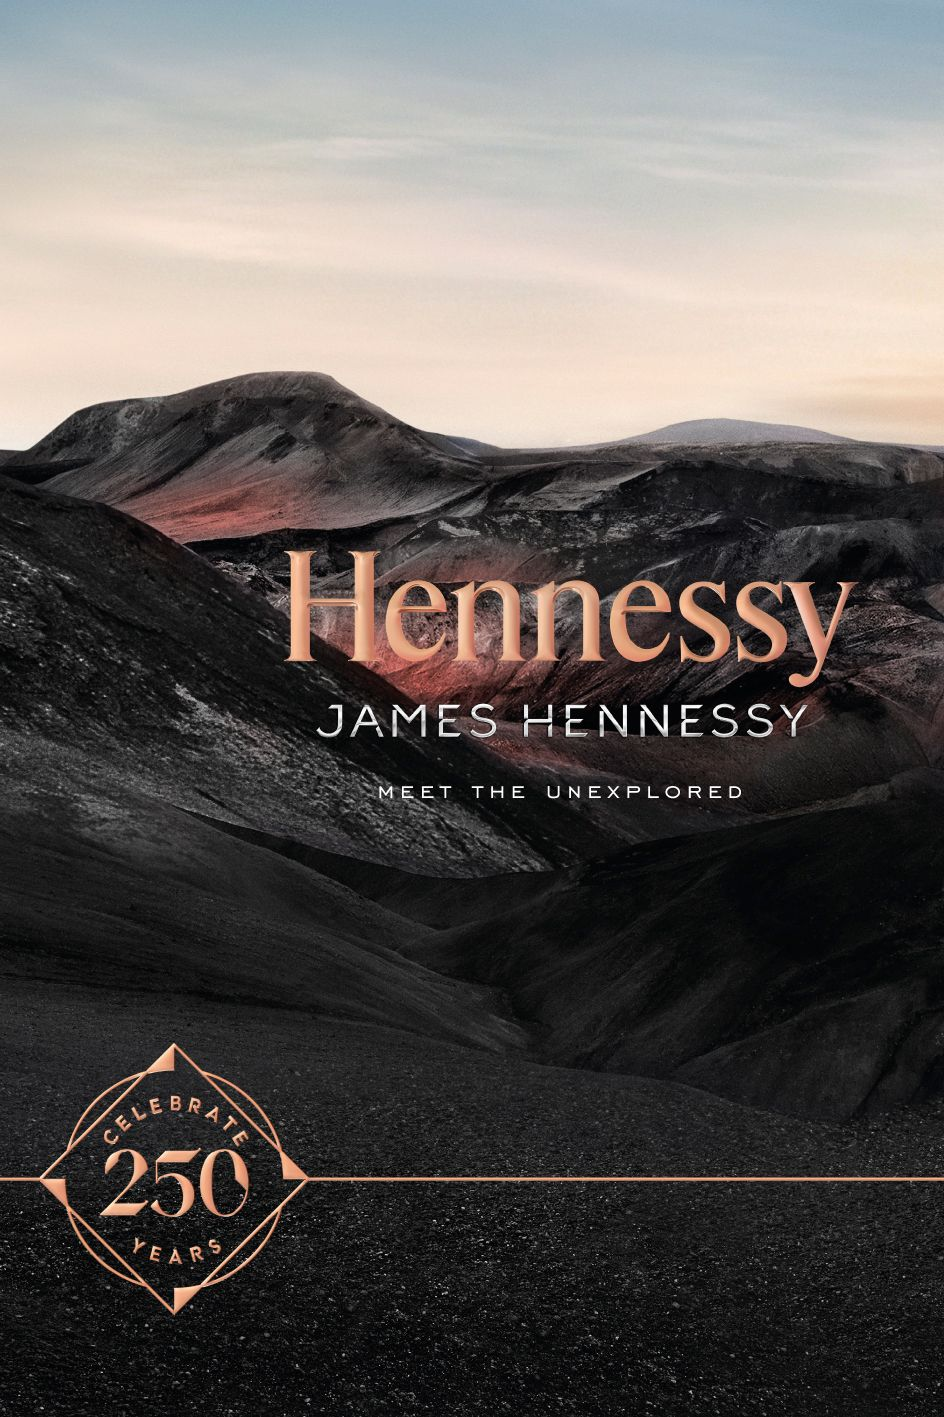 Hennessy 250th anniversary logo design